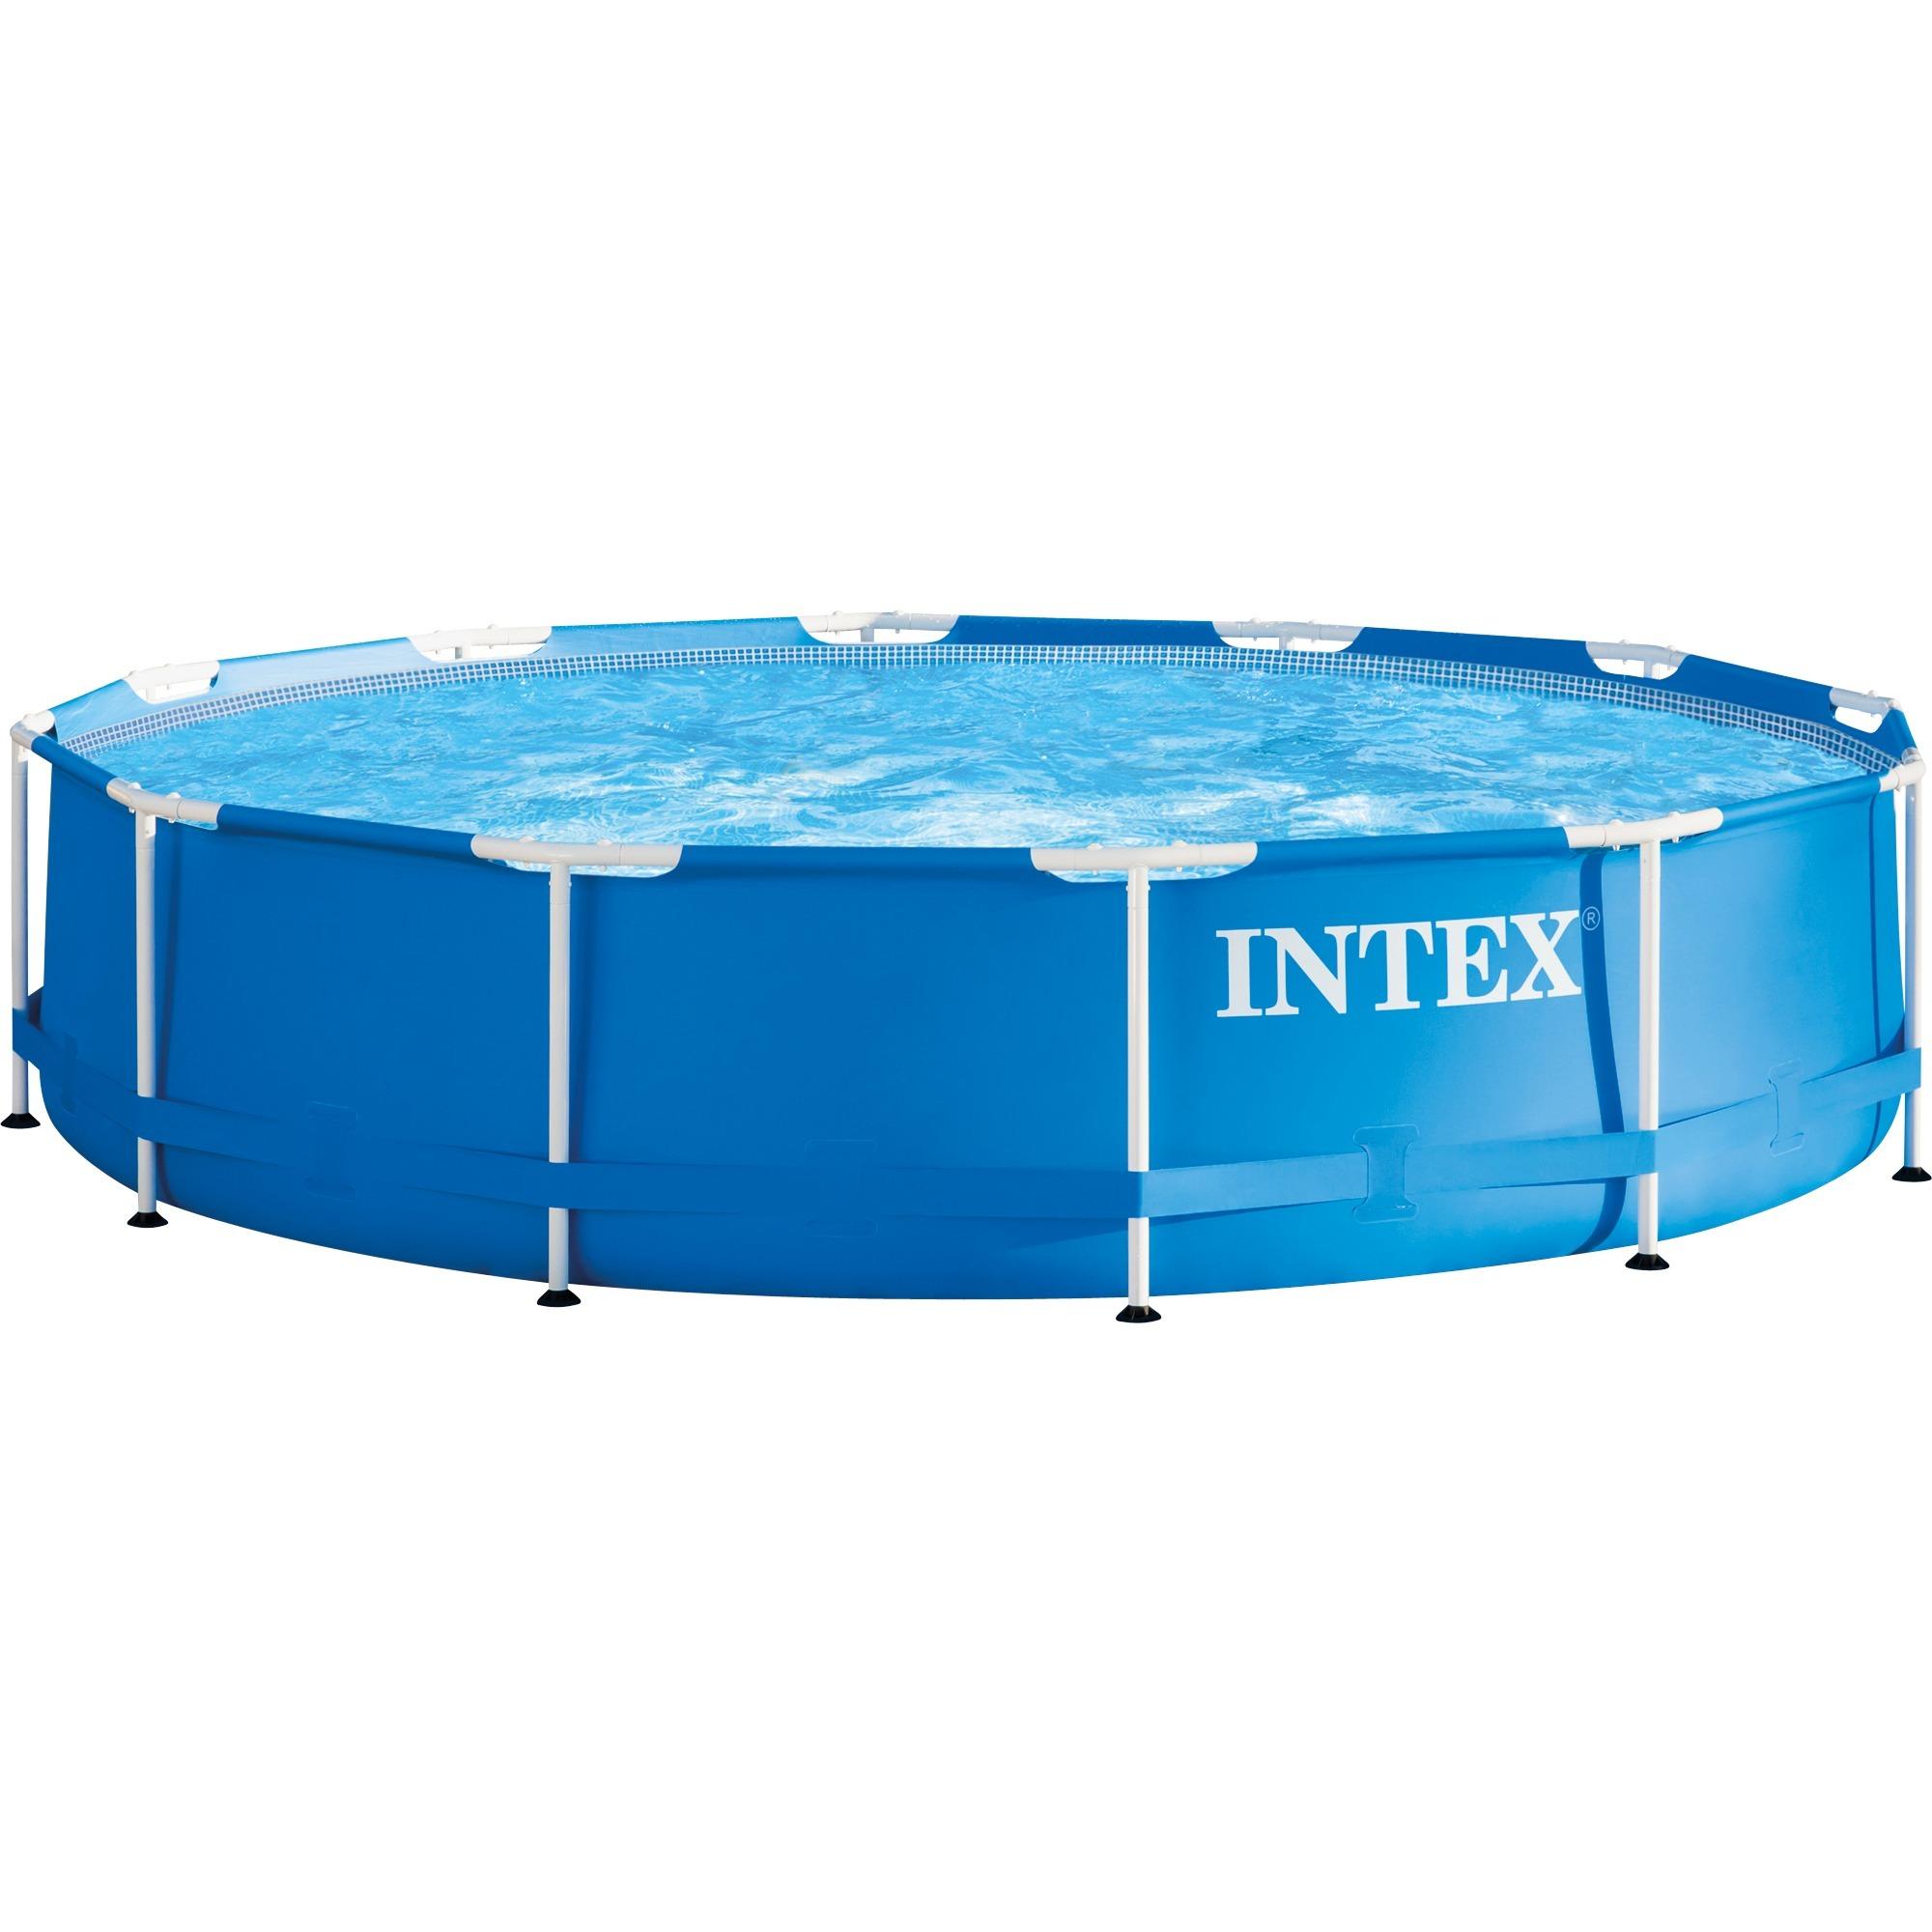 Piscine italia piscina intex easy prezzi migliori offerte - Offerte piscine intex ...